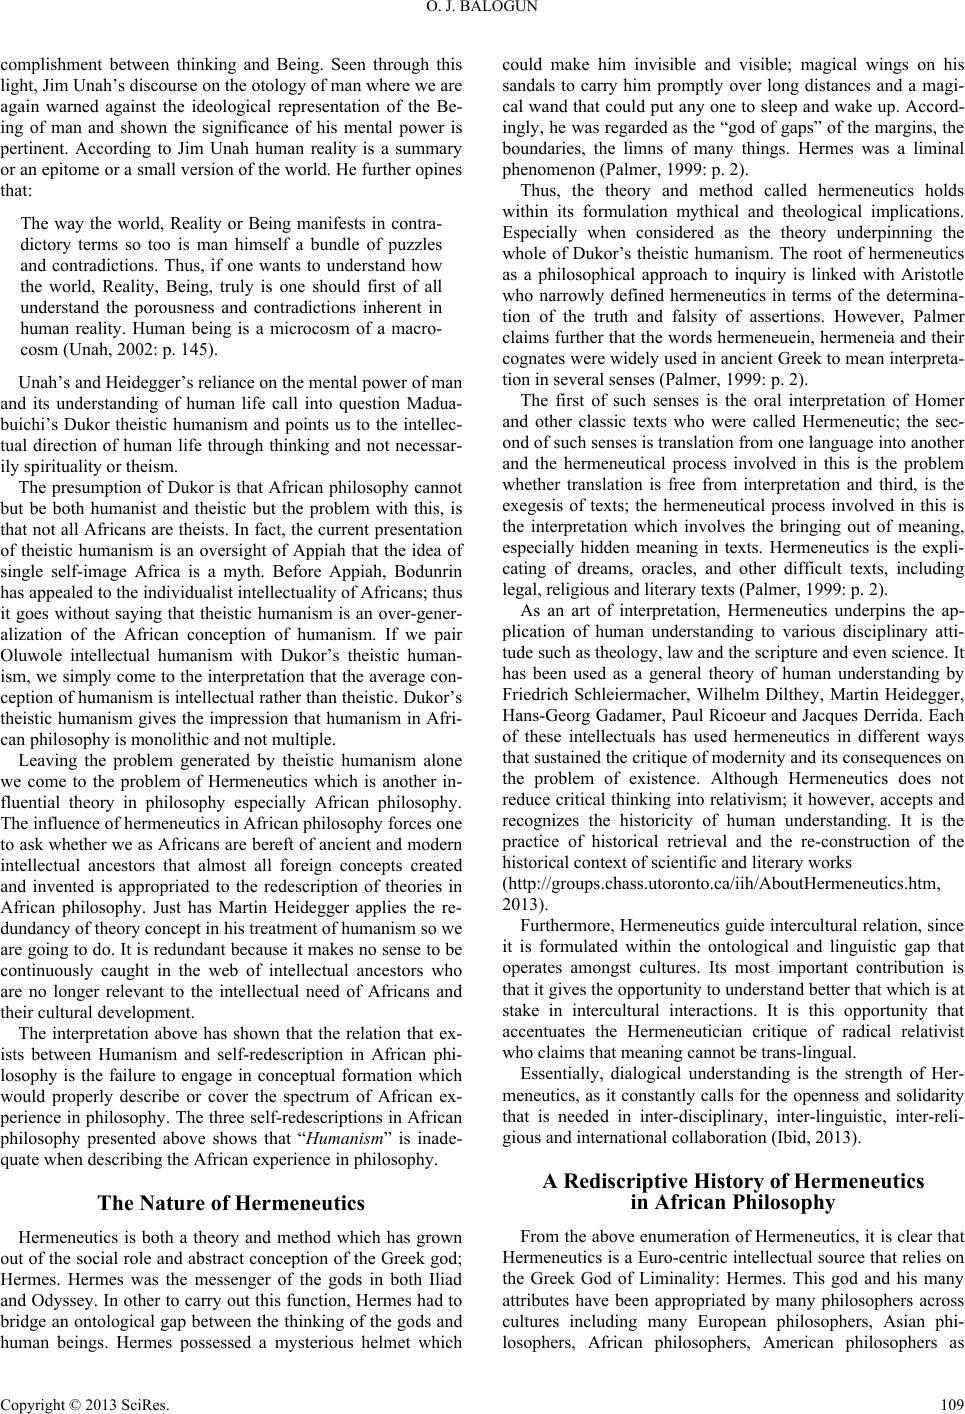 an analysis of how the philosophy hermeneutics was written by gadamer